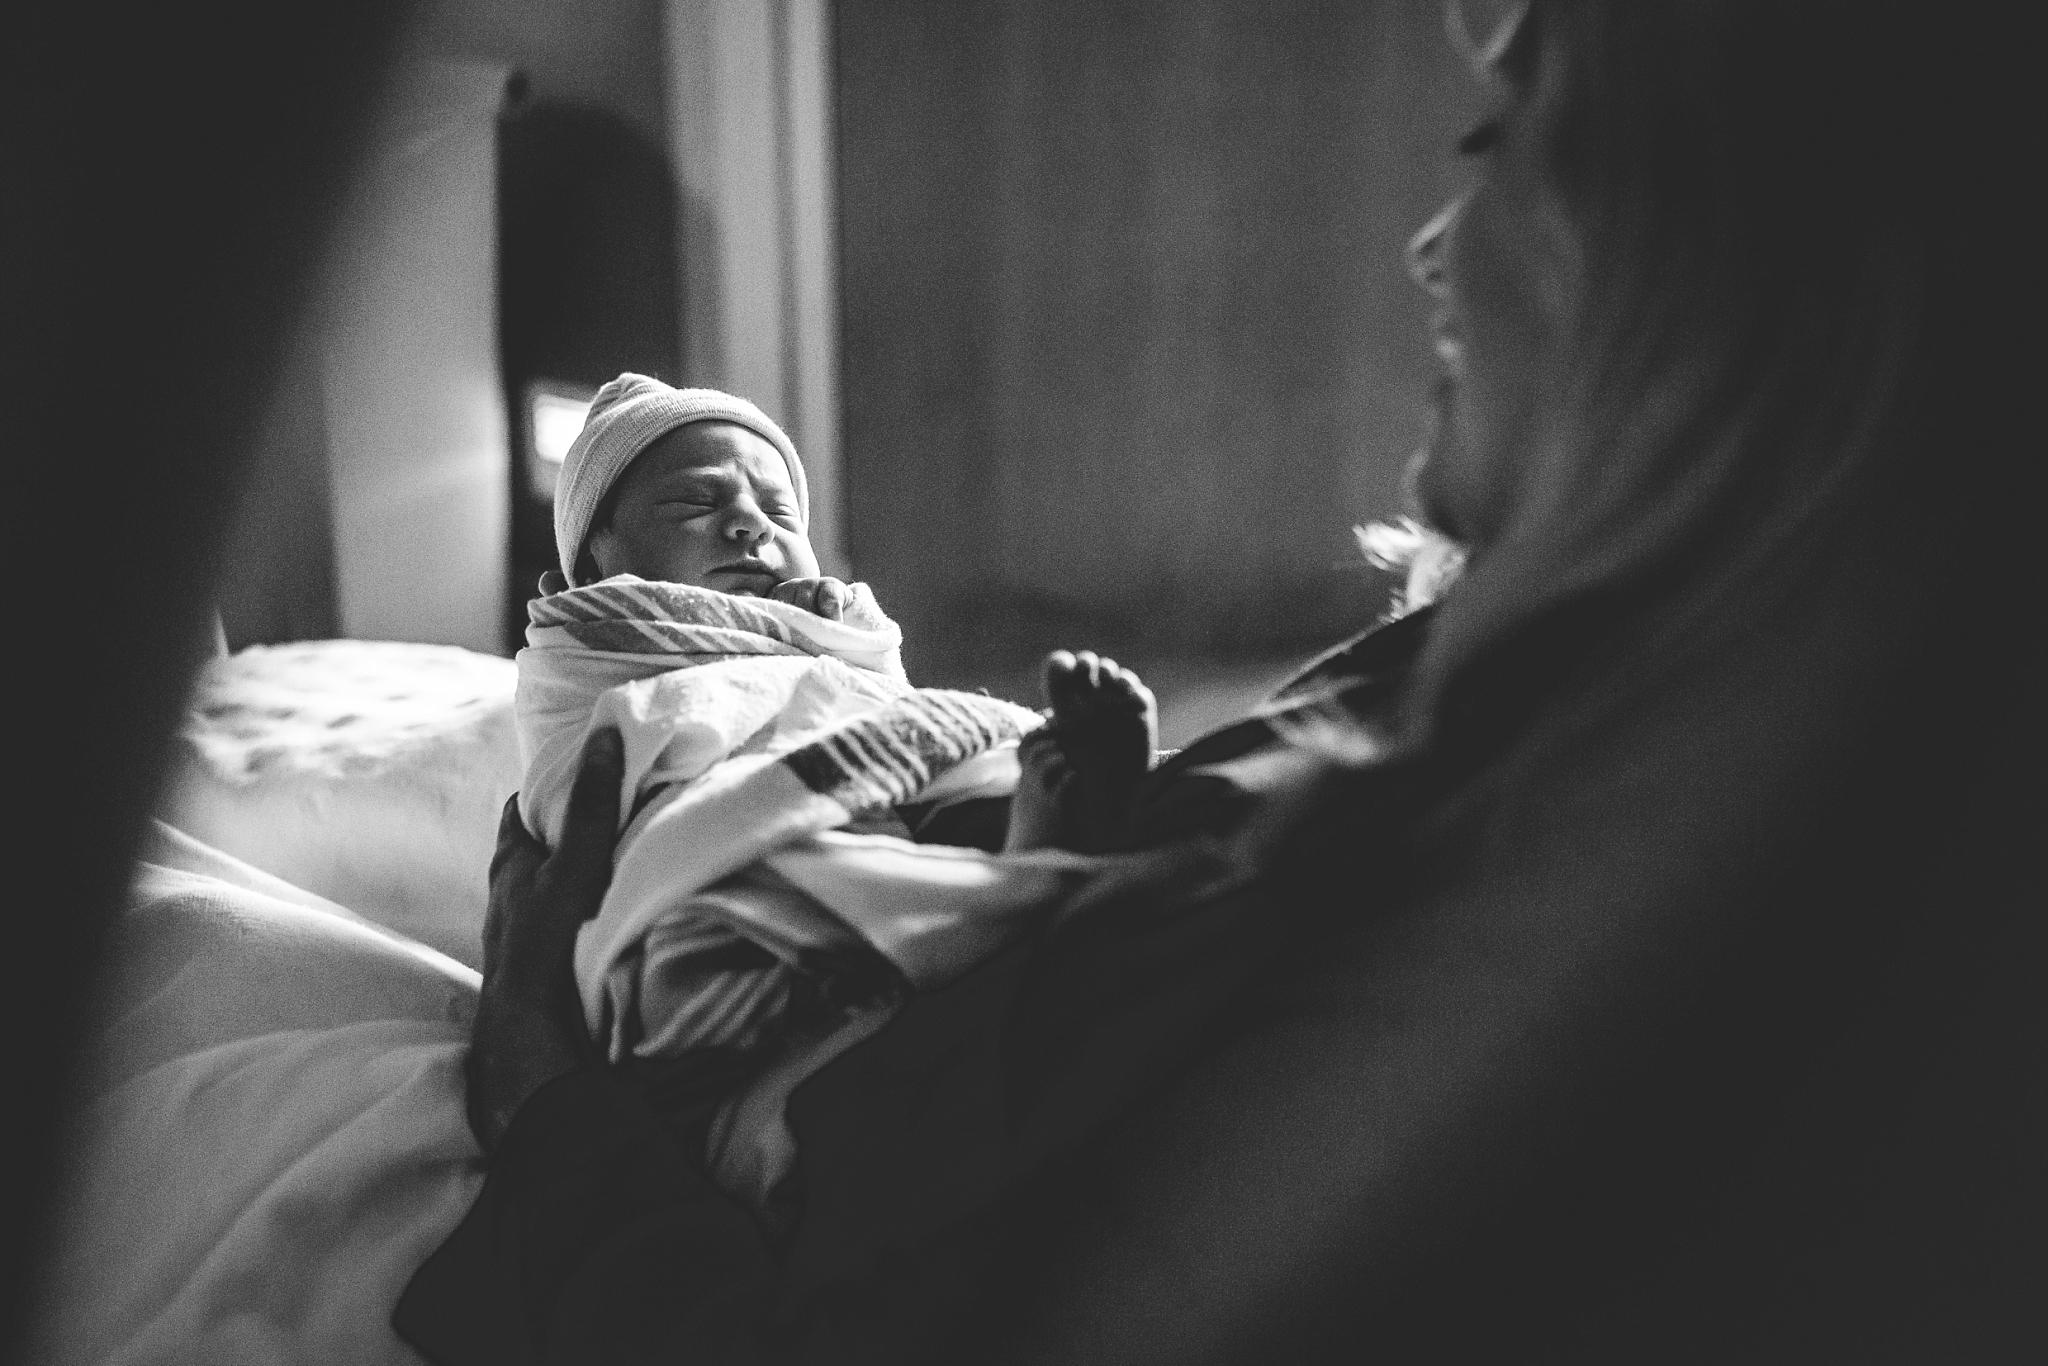 montgomery-county-md-newborn-hospital-lifestyle-photographer